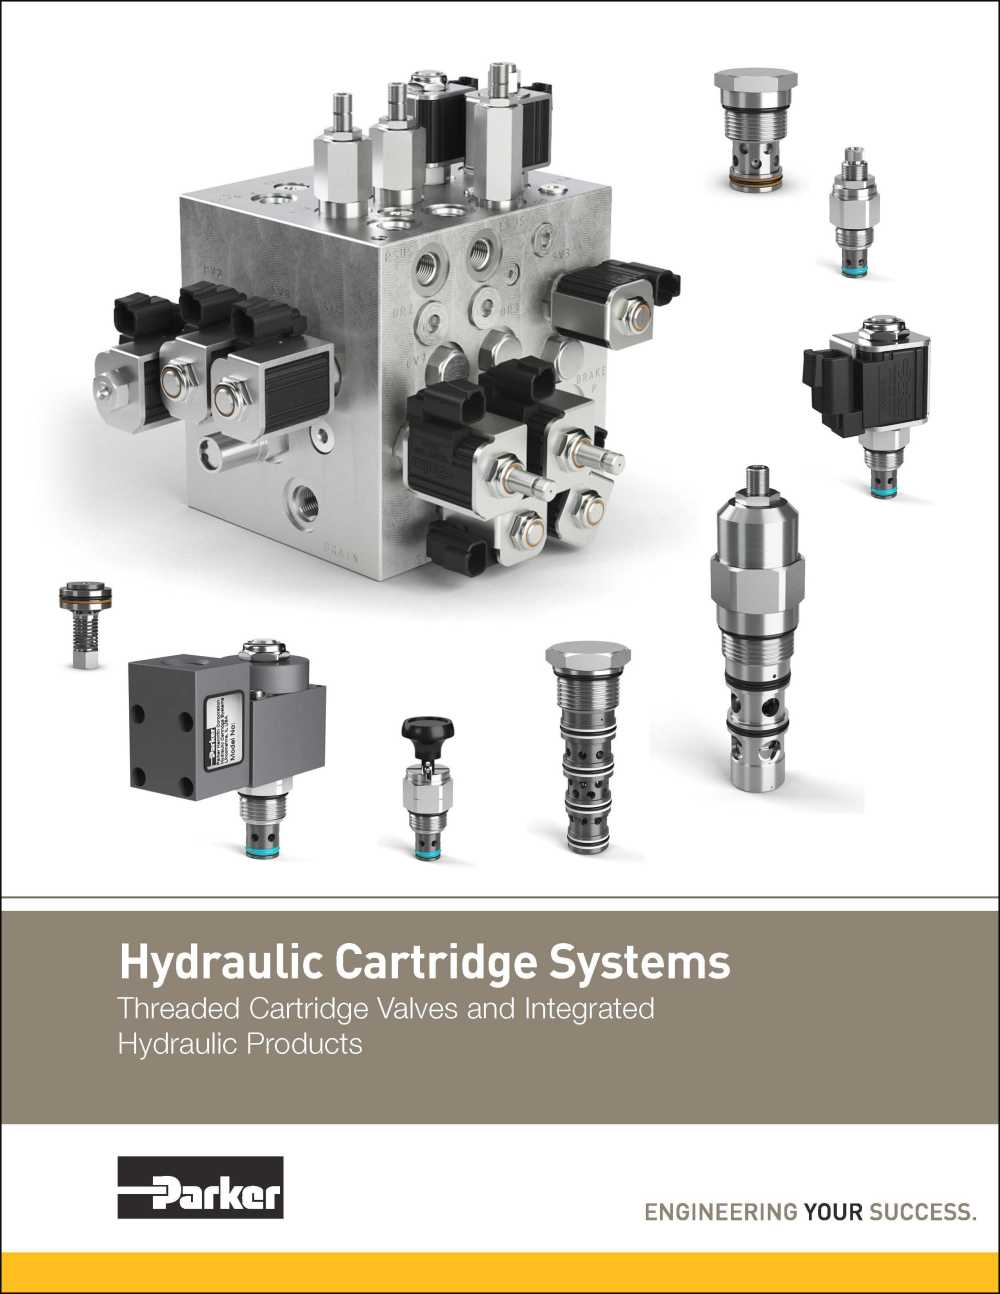 medium resolution of hydraulic cartridge systems parker a8 valve diagram parker valve diagram